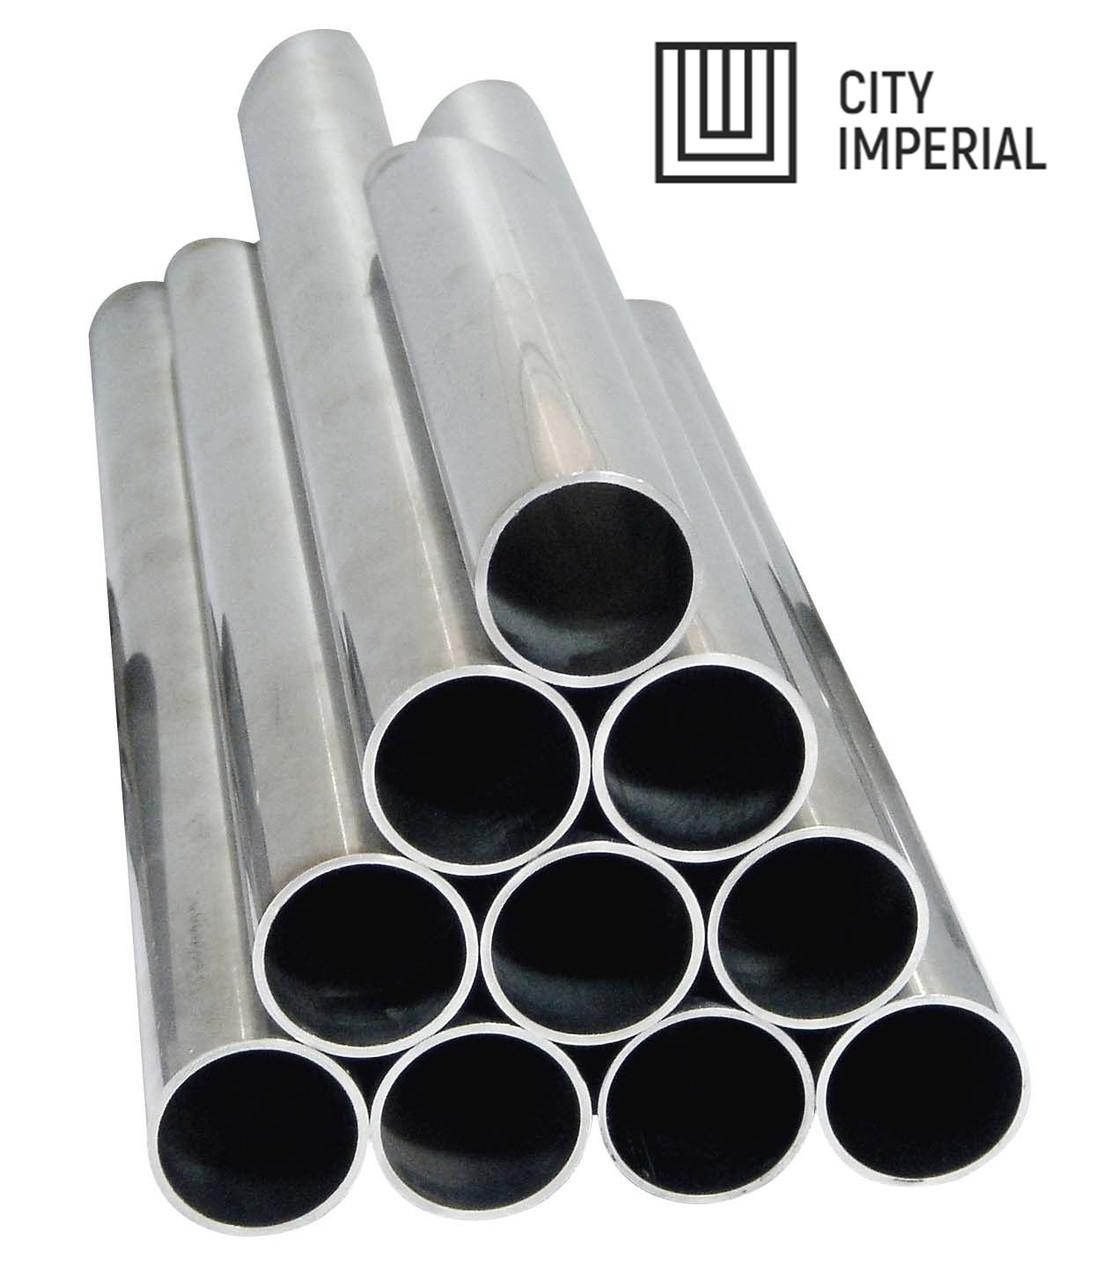 Труба 351 х 60 сталь 20